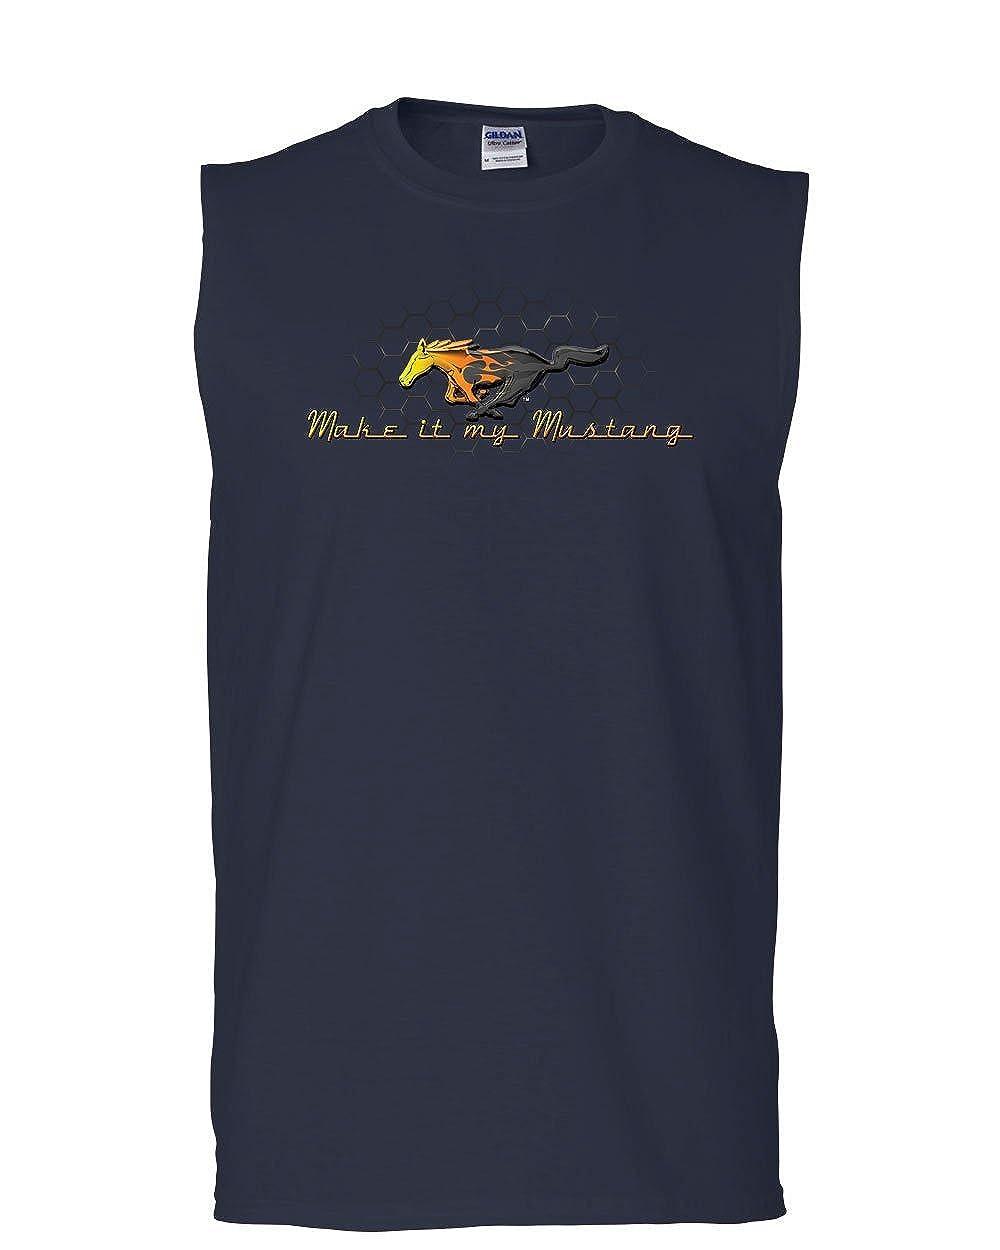 Make it My Mustang Muscle Shirt Honeycomb American Classic Fire Horse Sleeveless